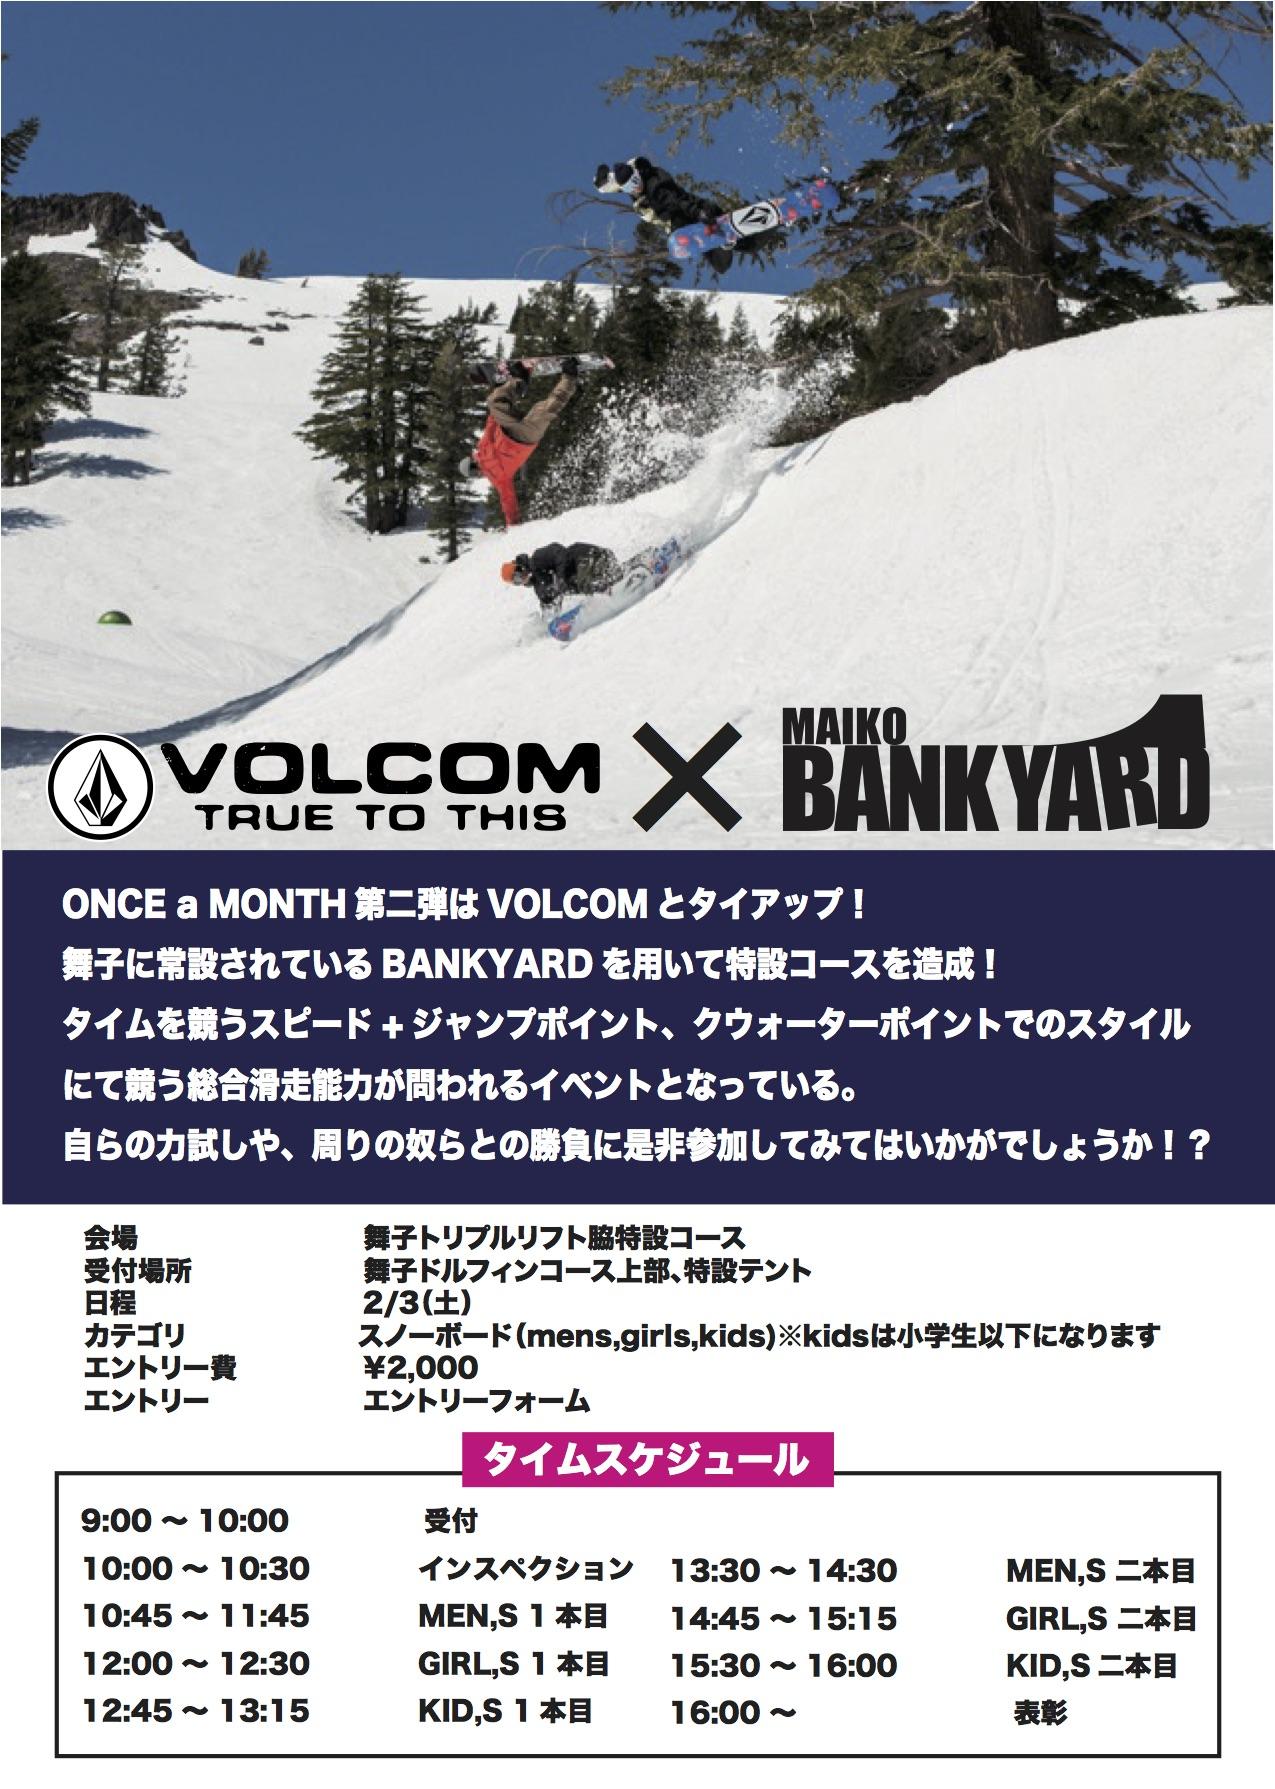 VOLCOMイベント広告